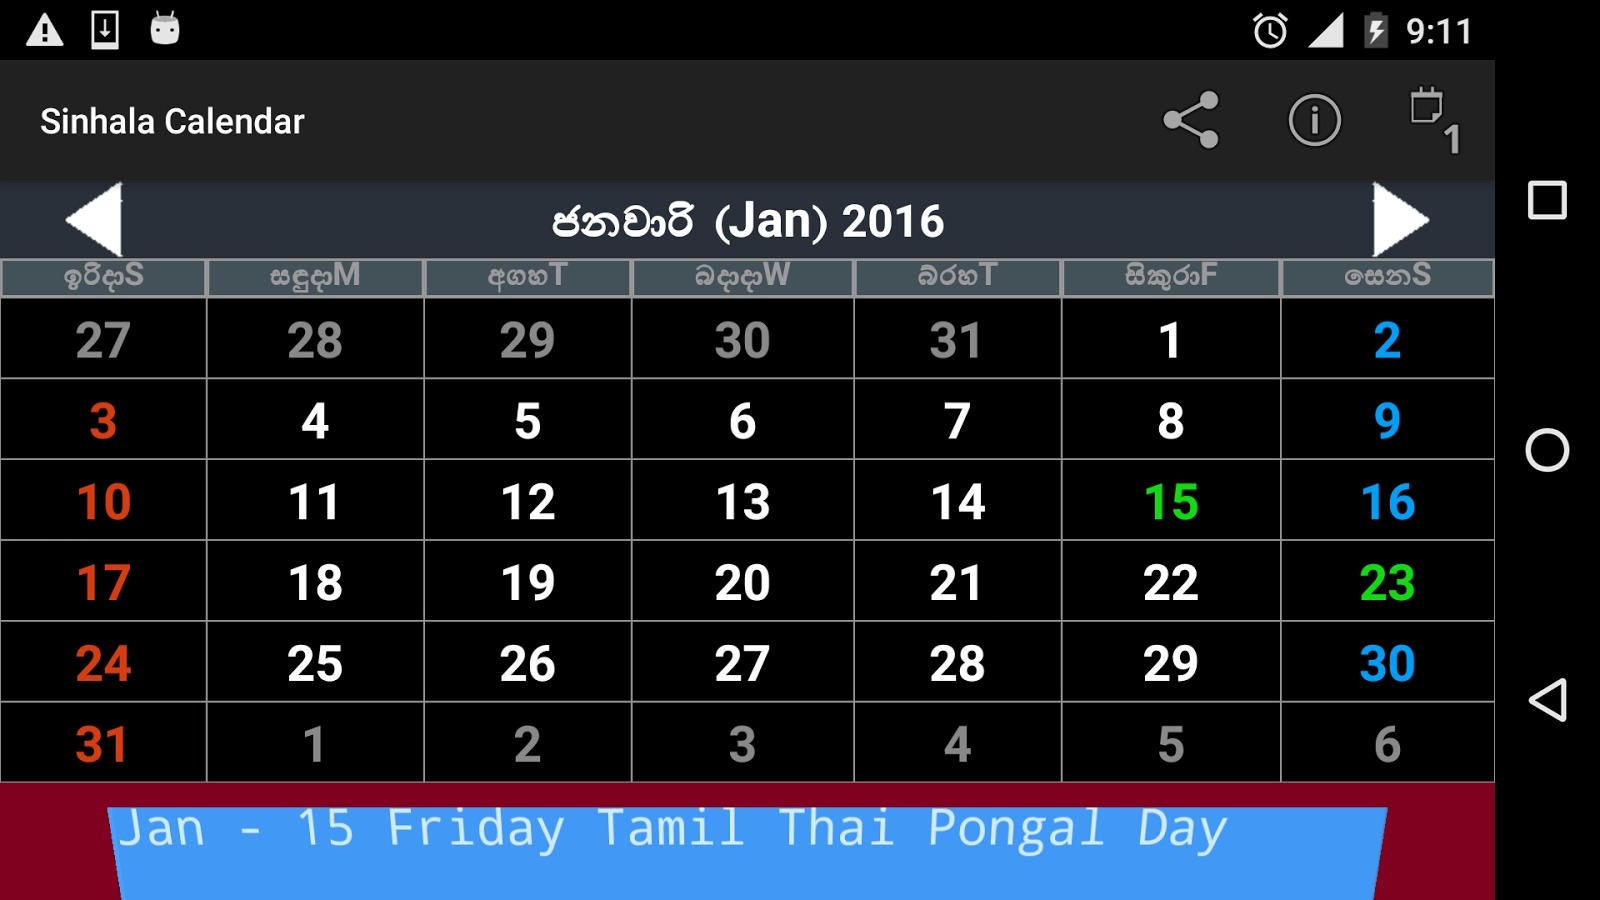 Sinhala Calendar 2016 0.1 Apk Download - Android Entertainment Apps Calendar Month In Sinhala